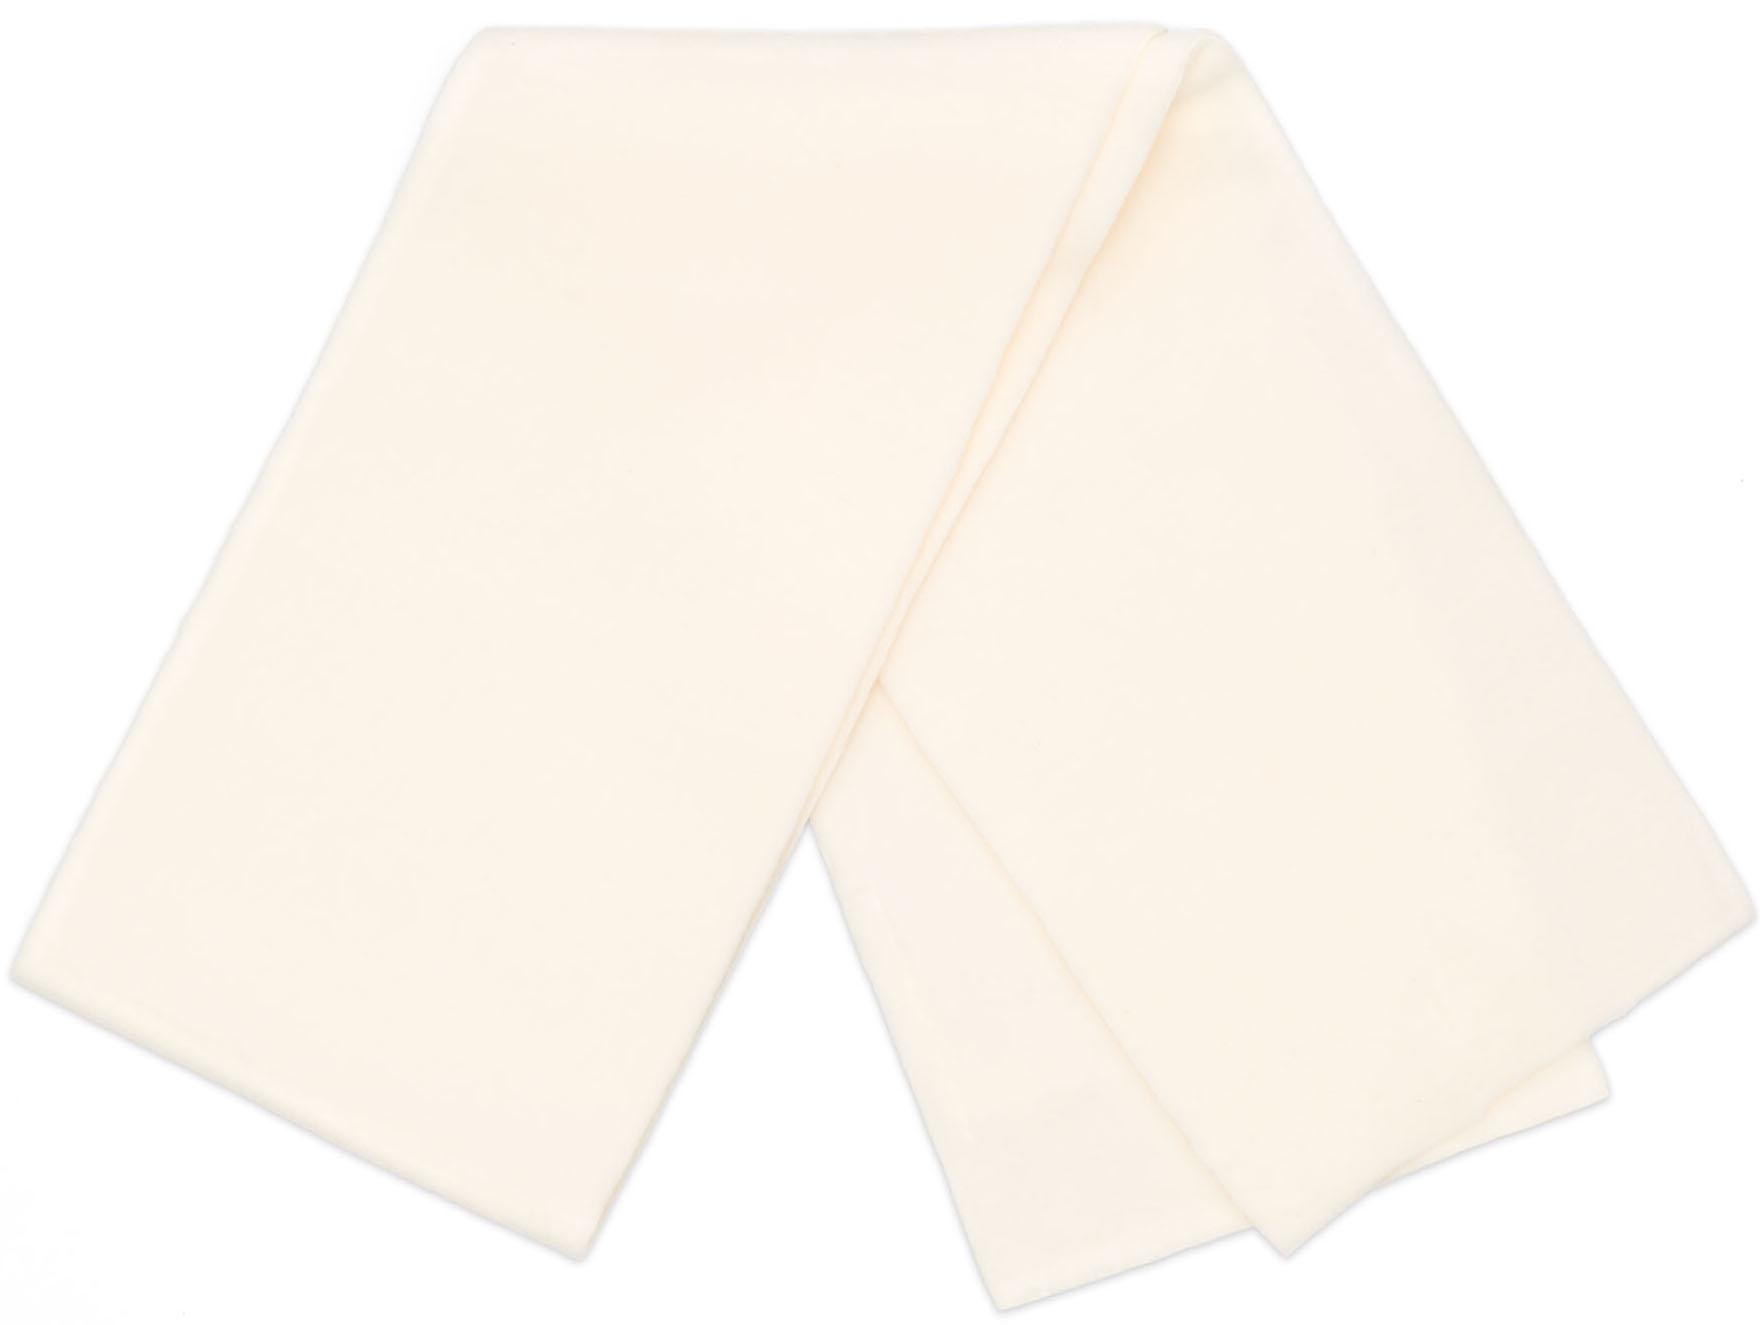 Шарфы Barkito Шарф для девочки Barkito бежевый варежки перчатки и шарфы coccodrillo шарф для девочки love cats